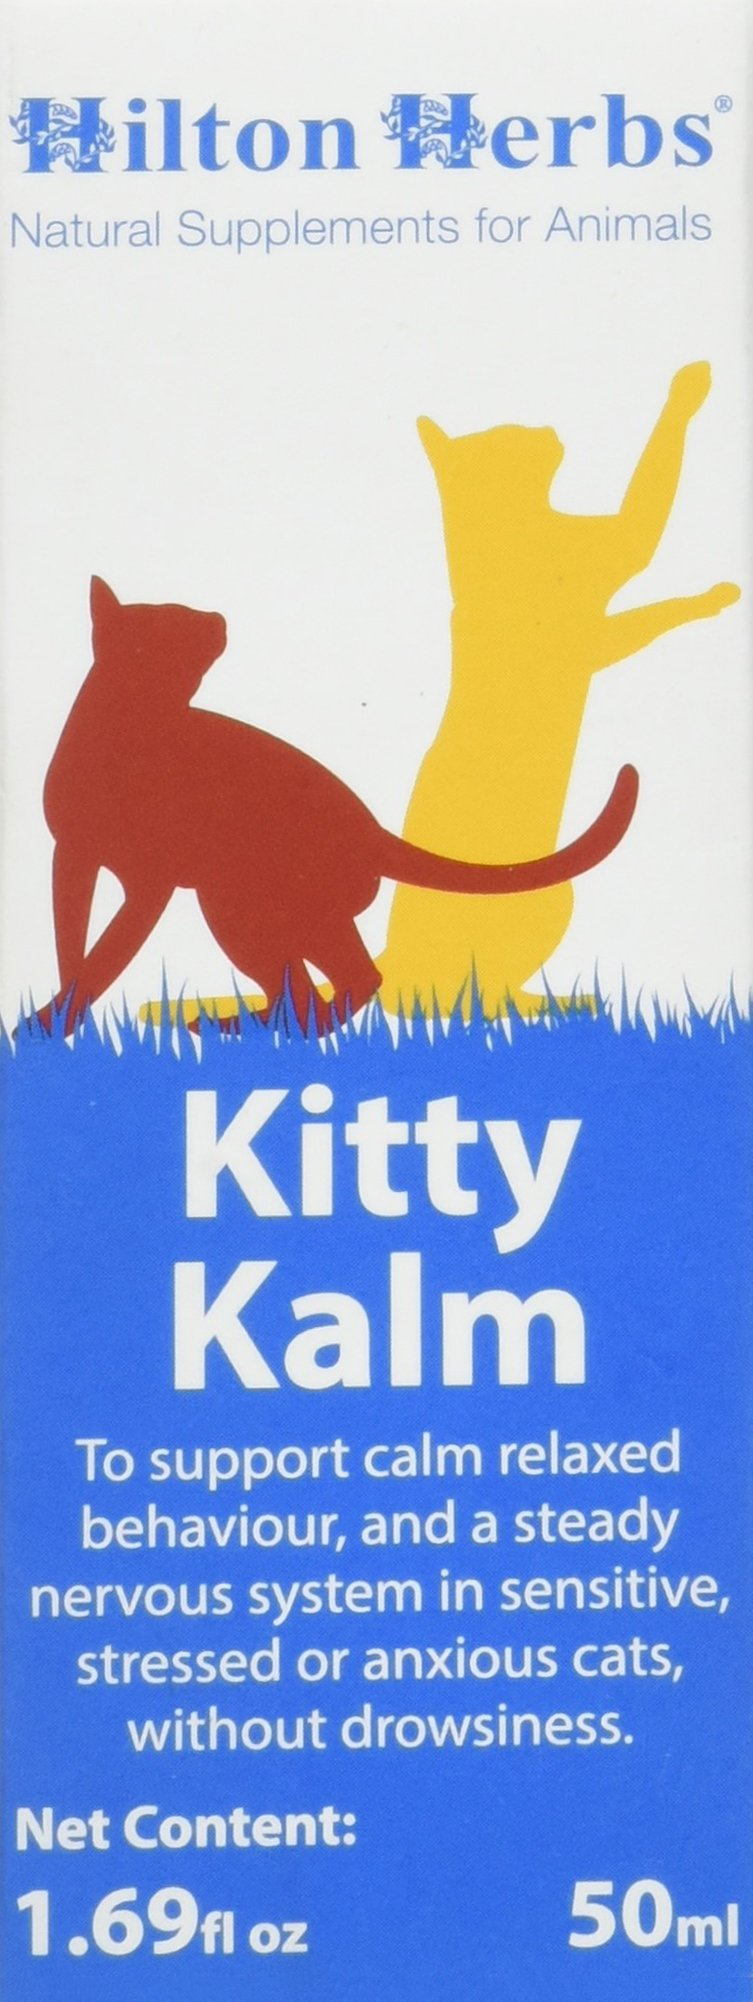 Hilton Herbs Kitty Kalm Herbal Supplement for Nervous/Anxious Cats, 1.69 fl oz (50 ml) Bottle